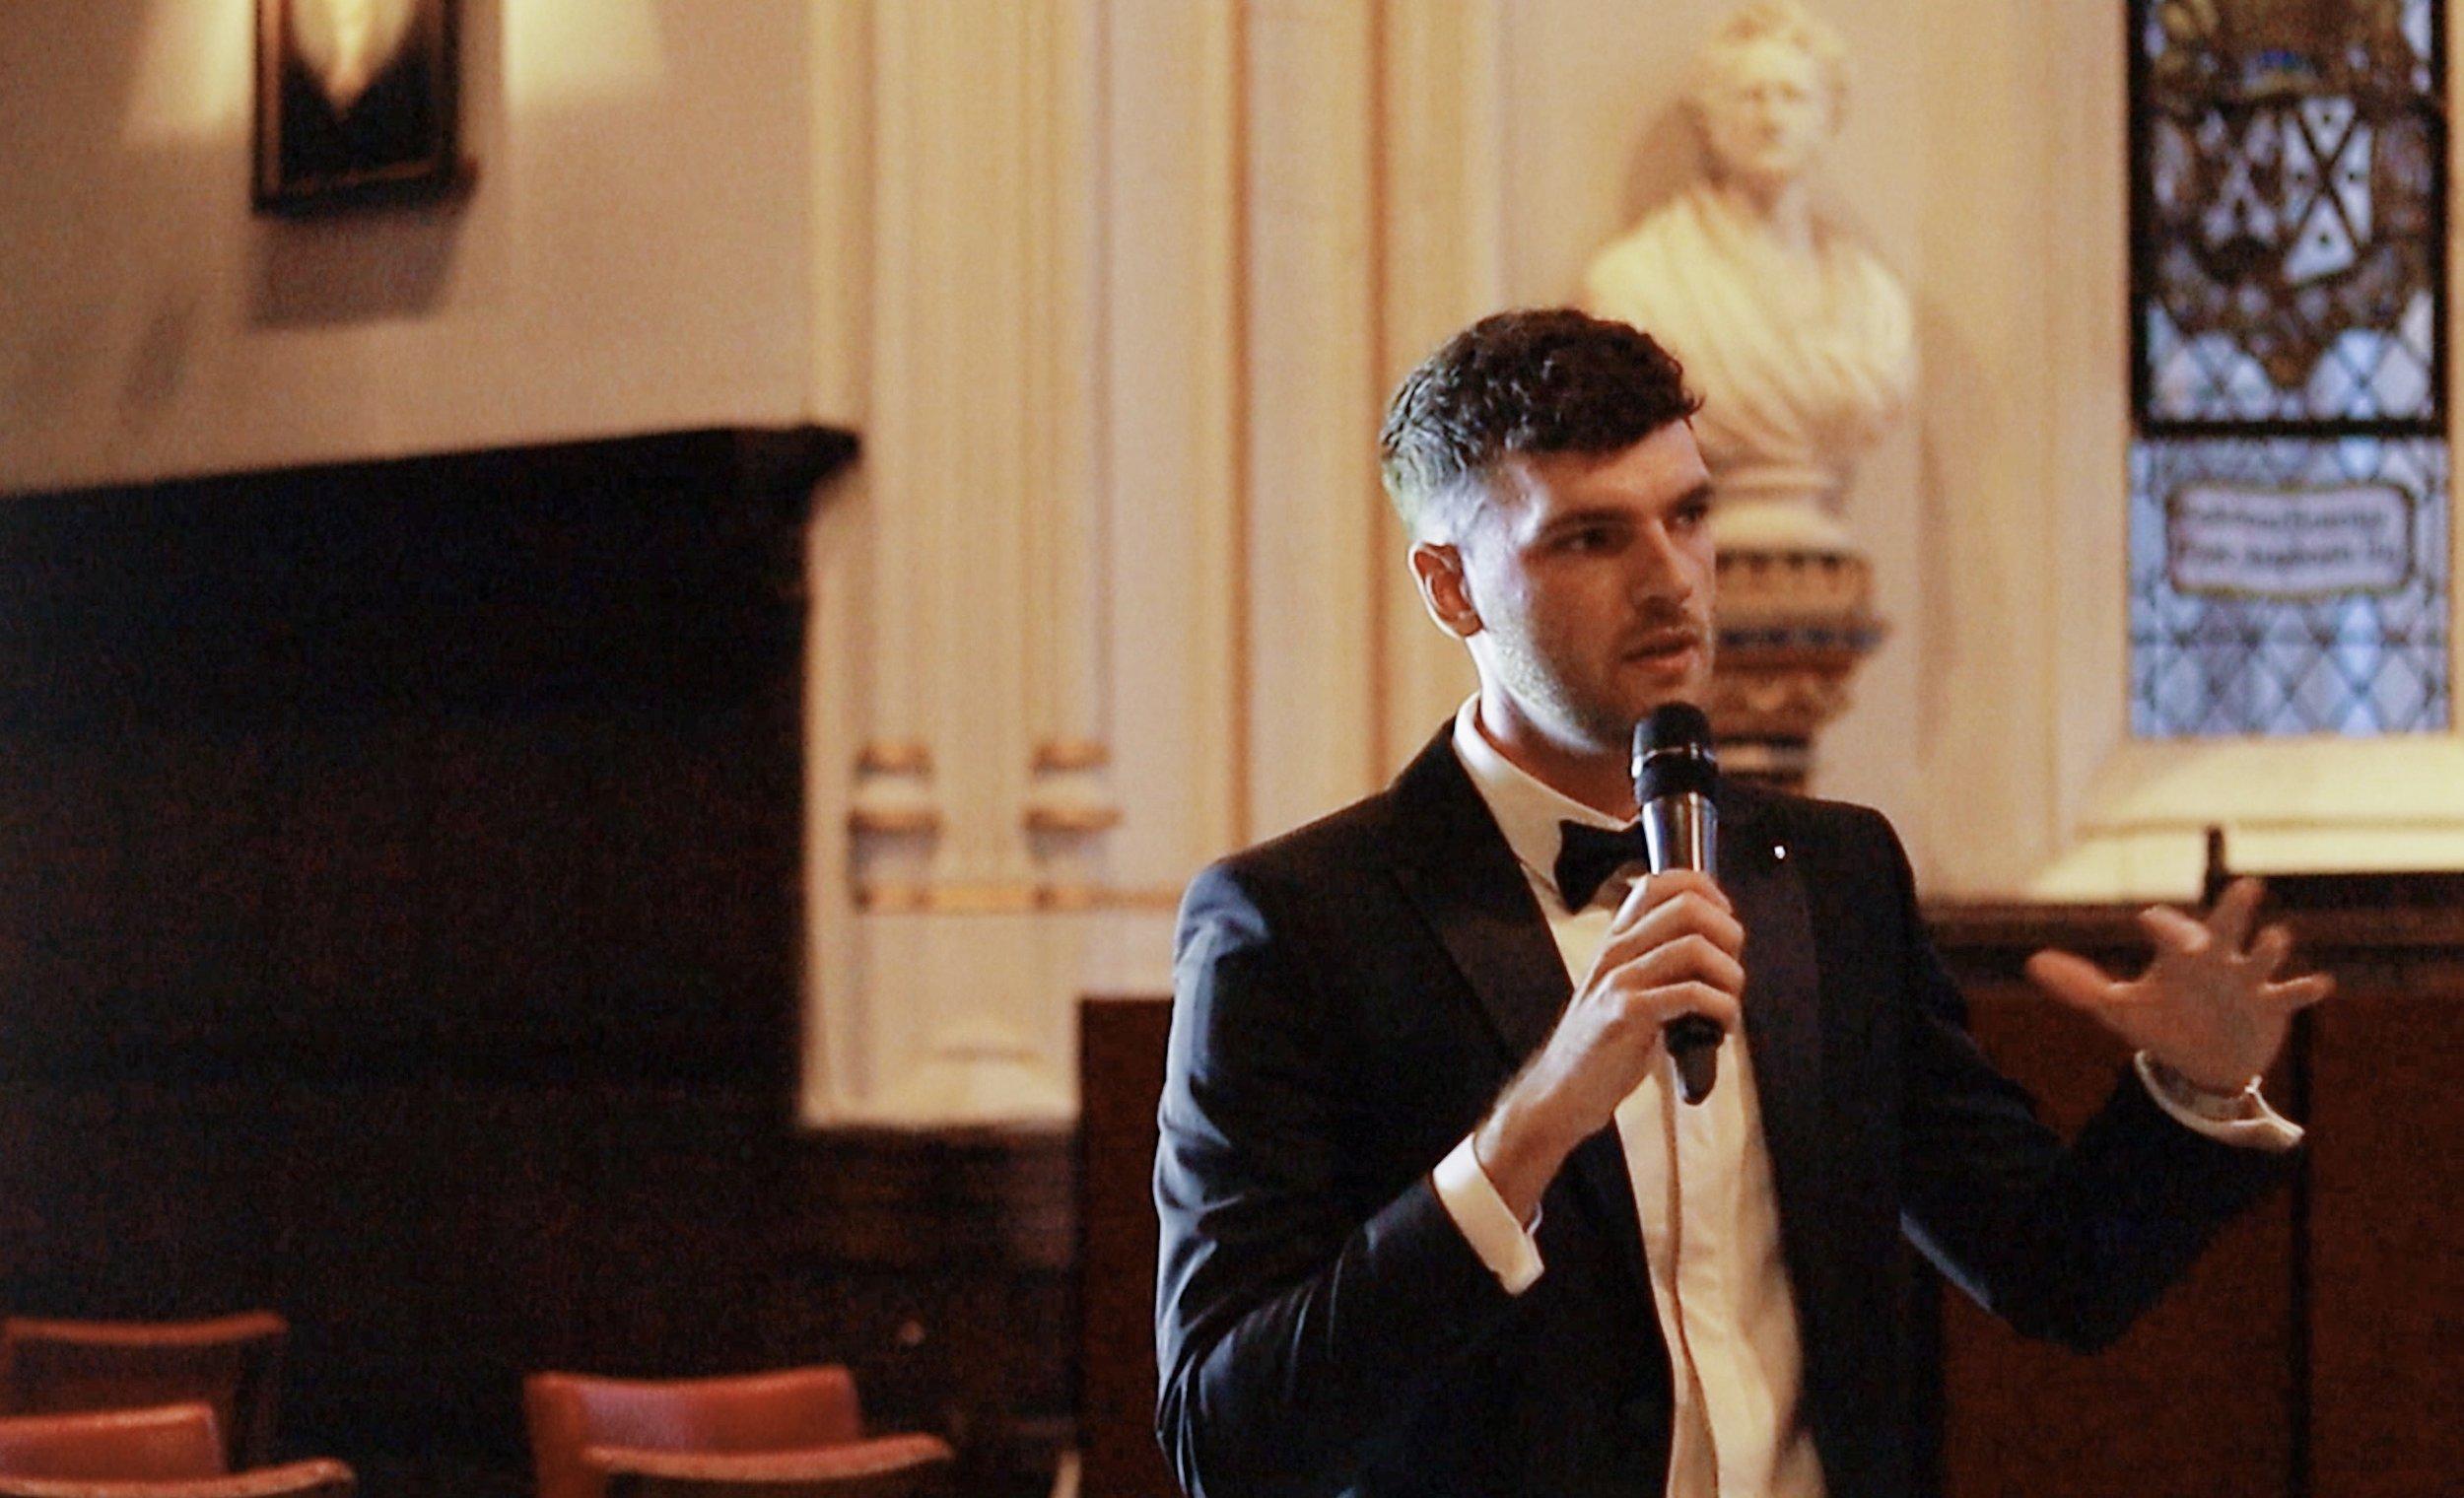 Talk at St Johns College, Cambridge University